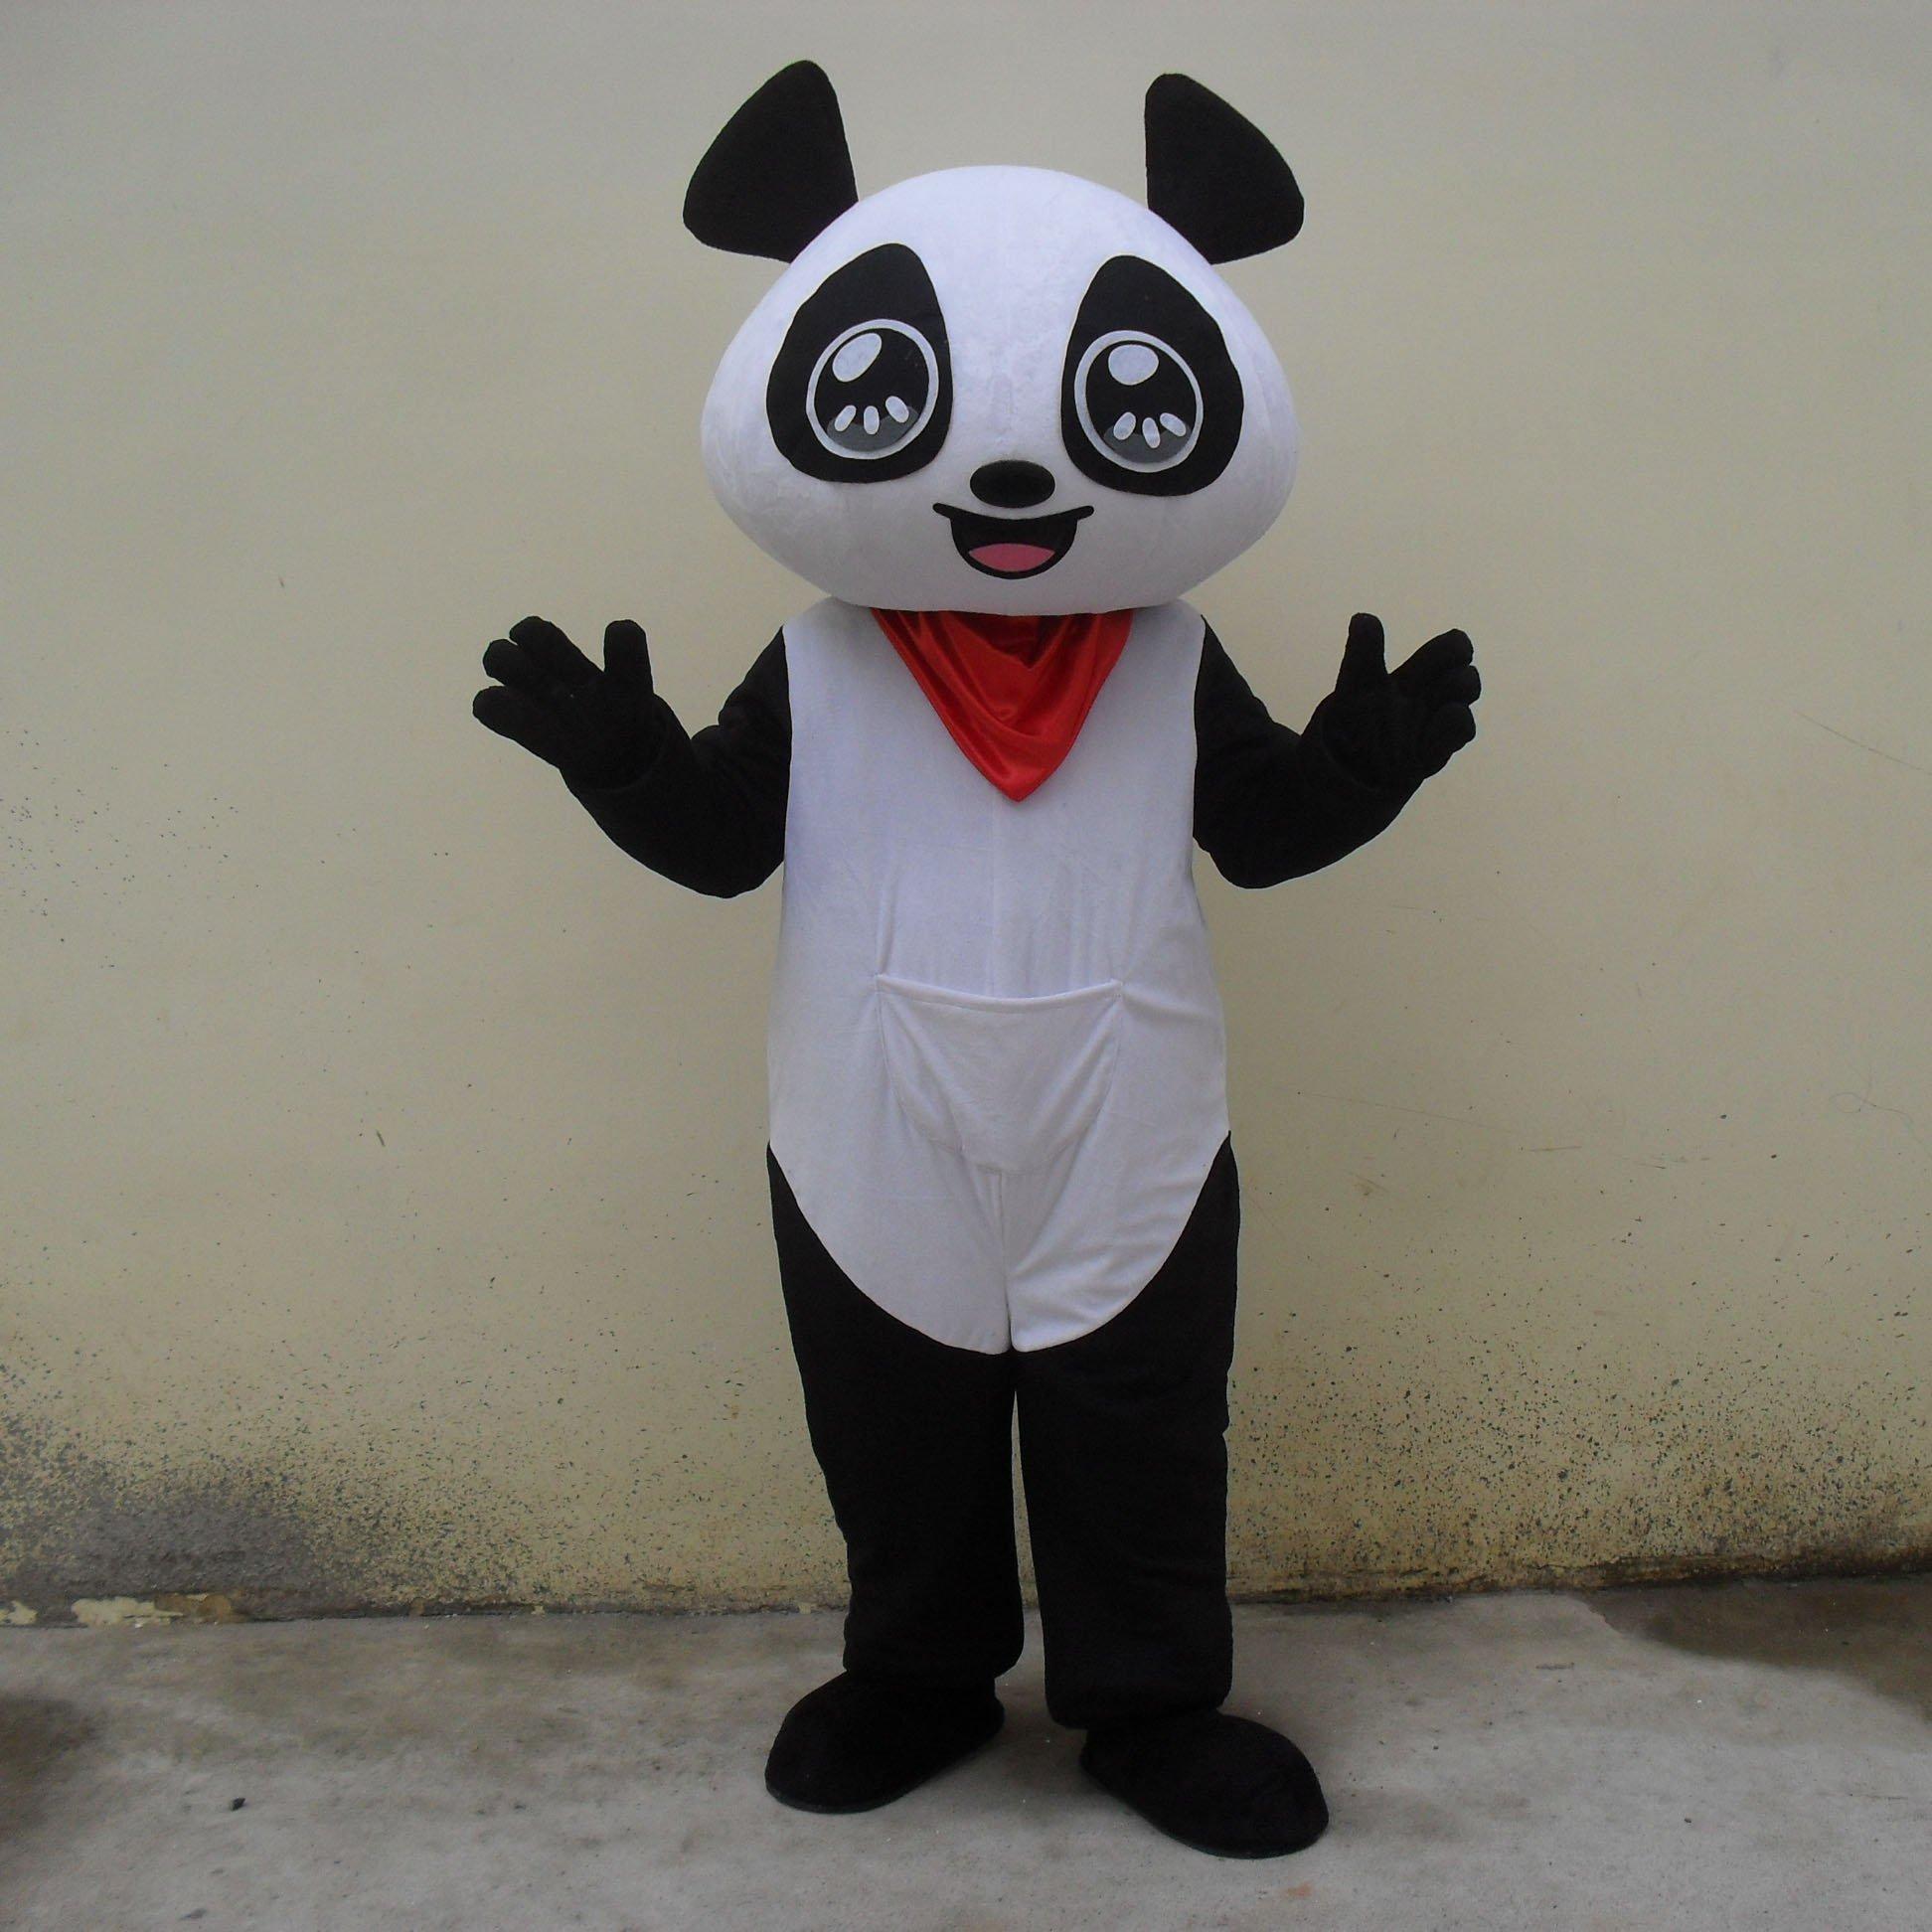 Baby Bear Cartoon Doll Clothing Cartoon Walking Doll Clothing Cartoon Show Clothing Doll Clothes Panda Mascot Costume